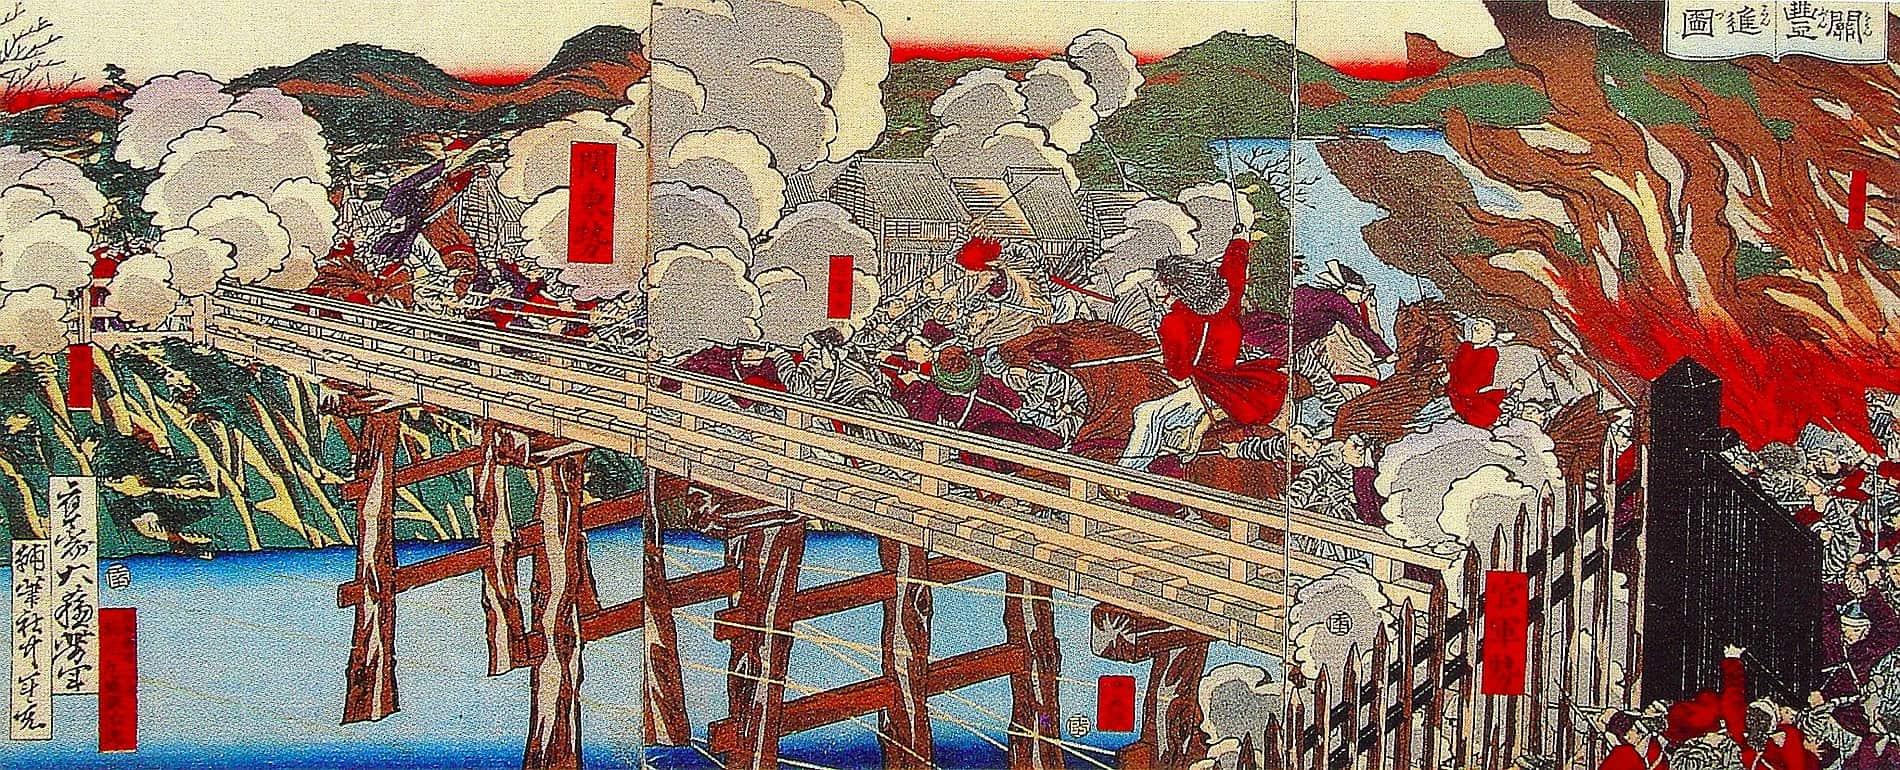 Troops clash on the bridge at Fushimi